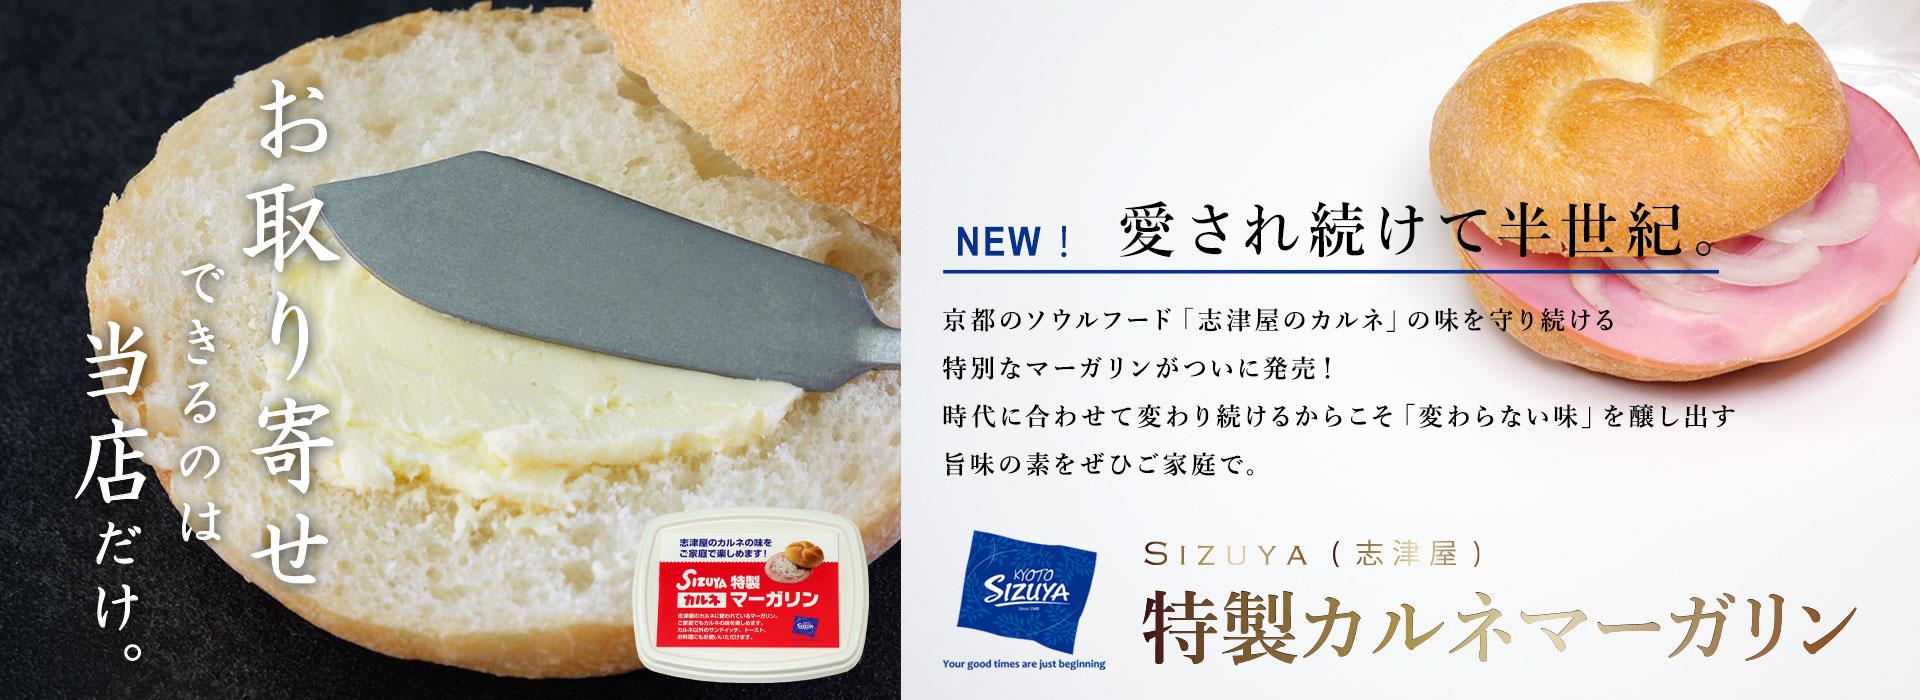 SIZUYA特製カルネマーガリン 志津屋(しずや) 500g